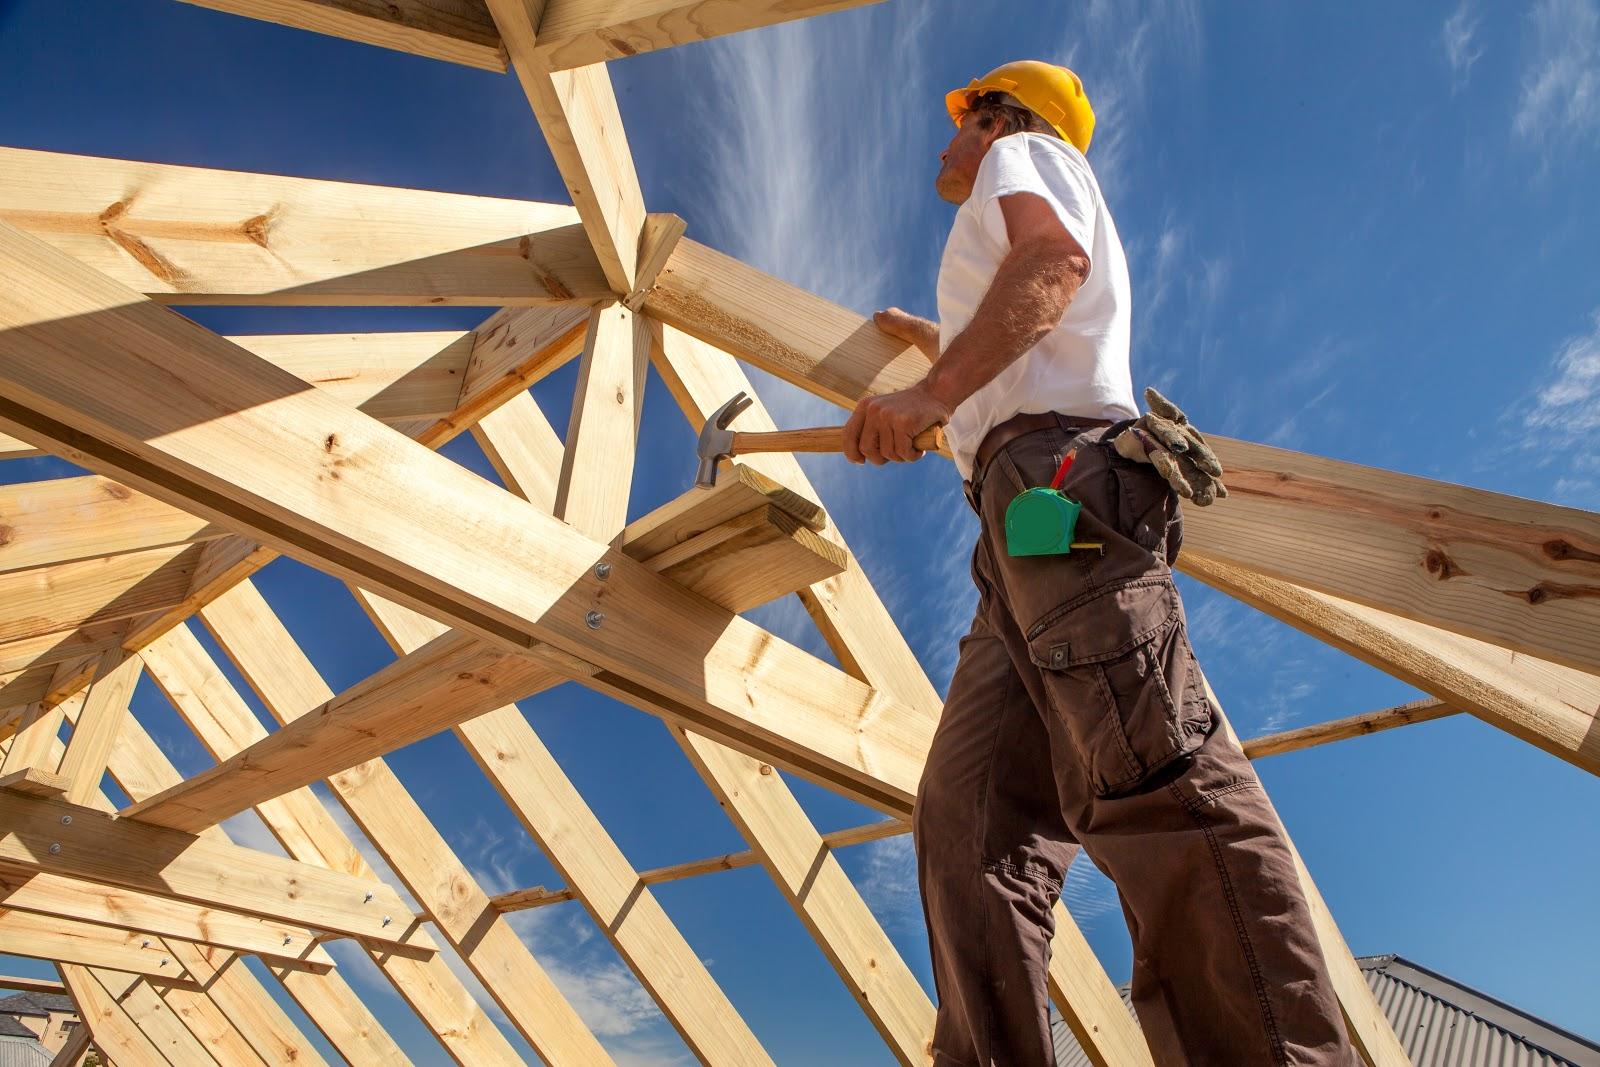 Builder surveying wooden beams